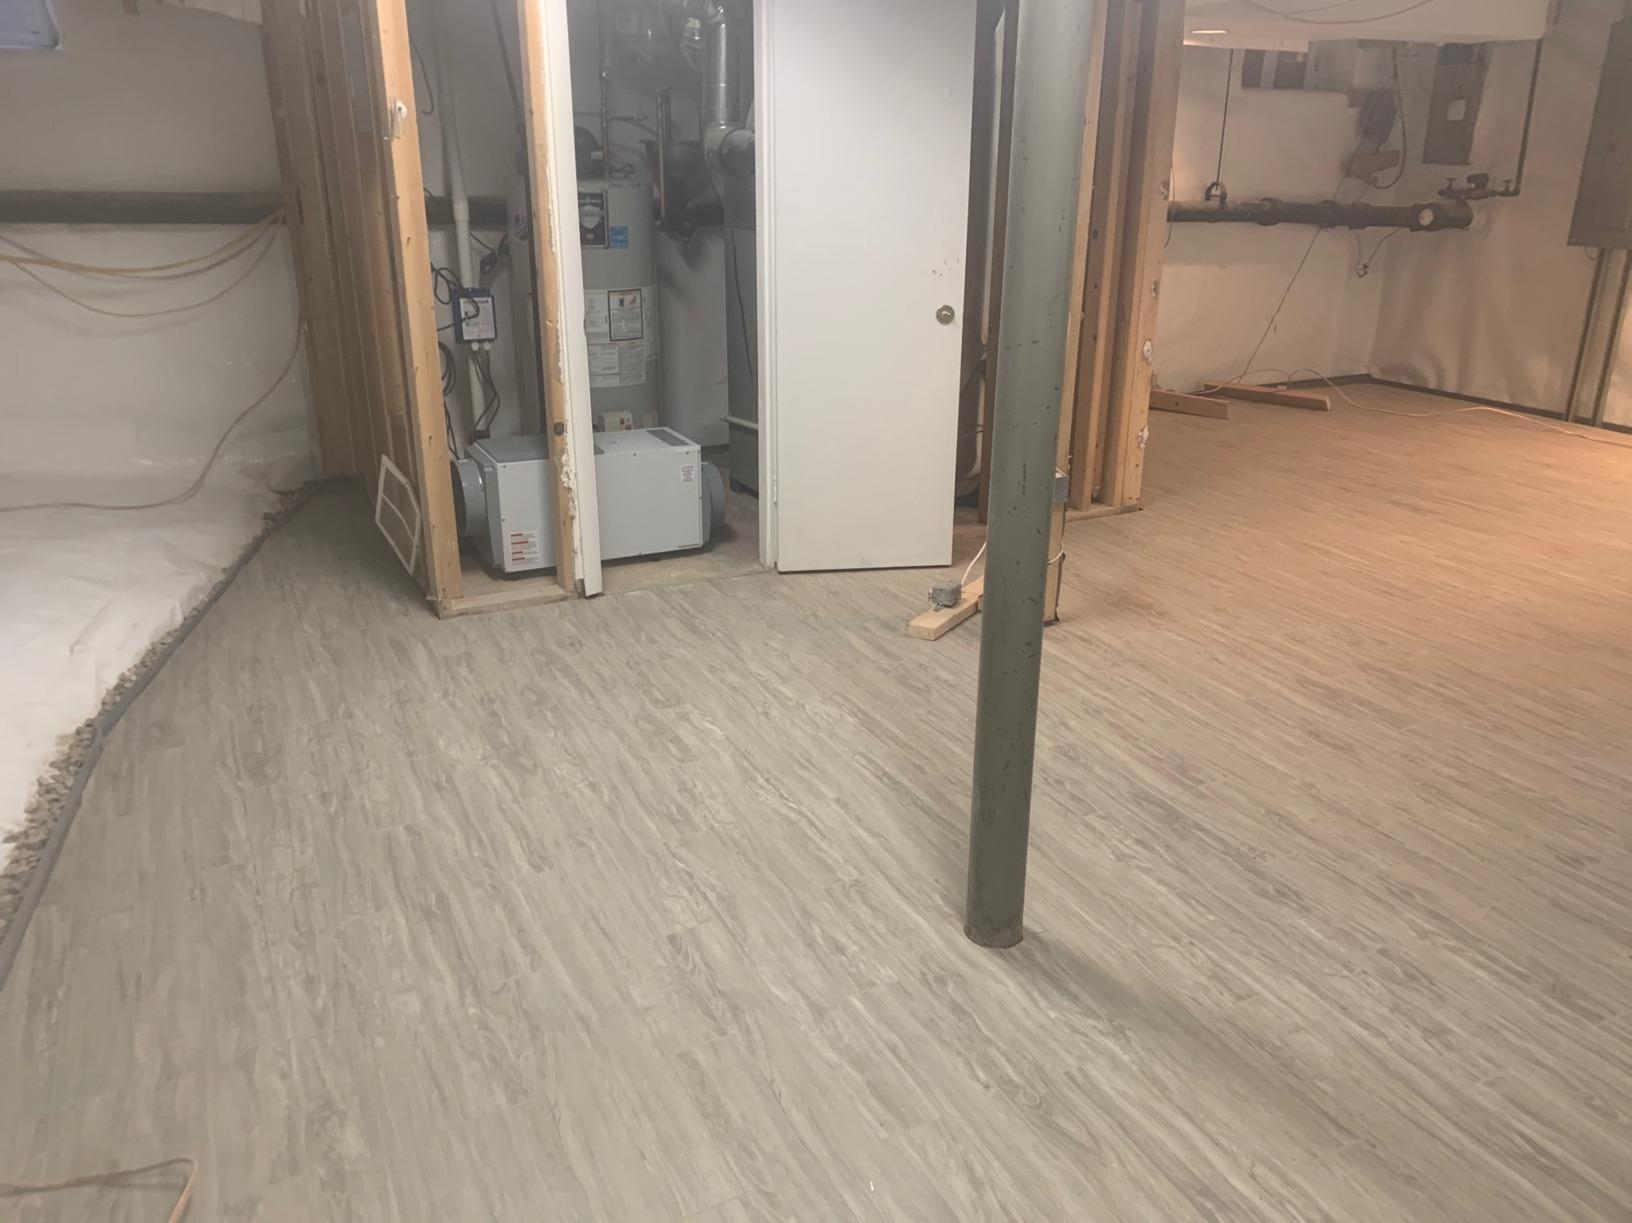 Basement Floor Installation in Wayne, PA - After Photo